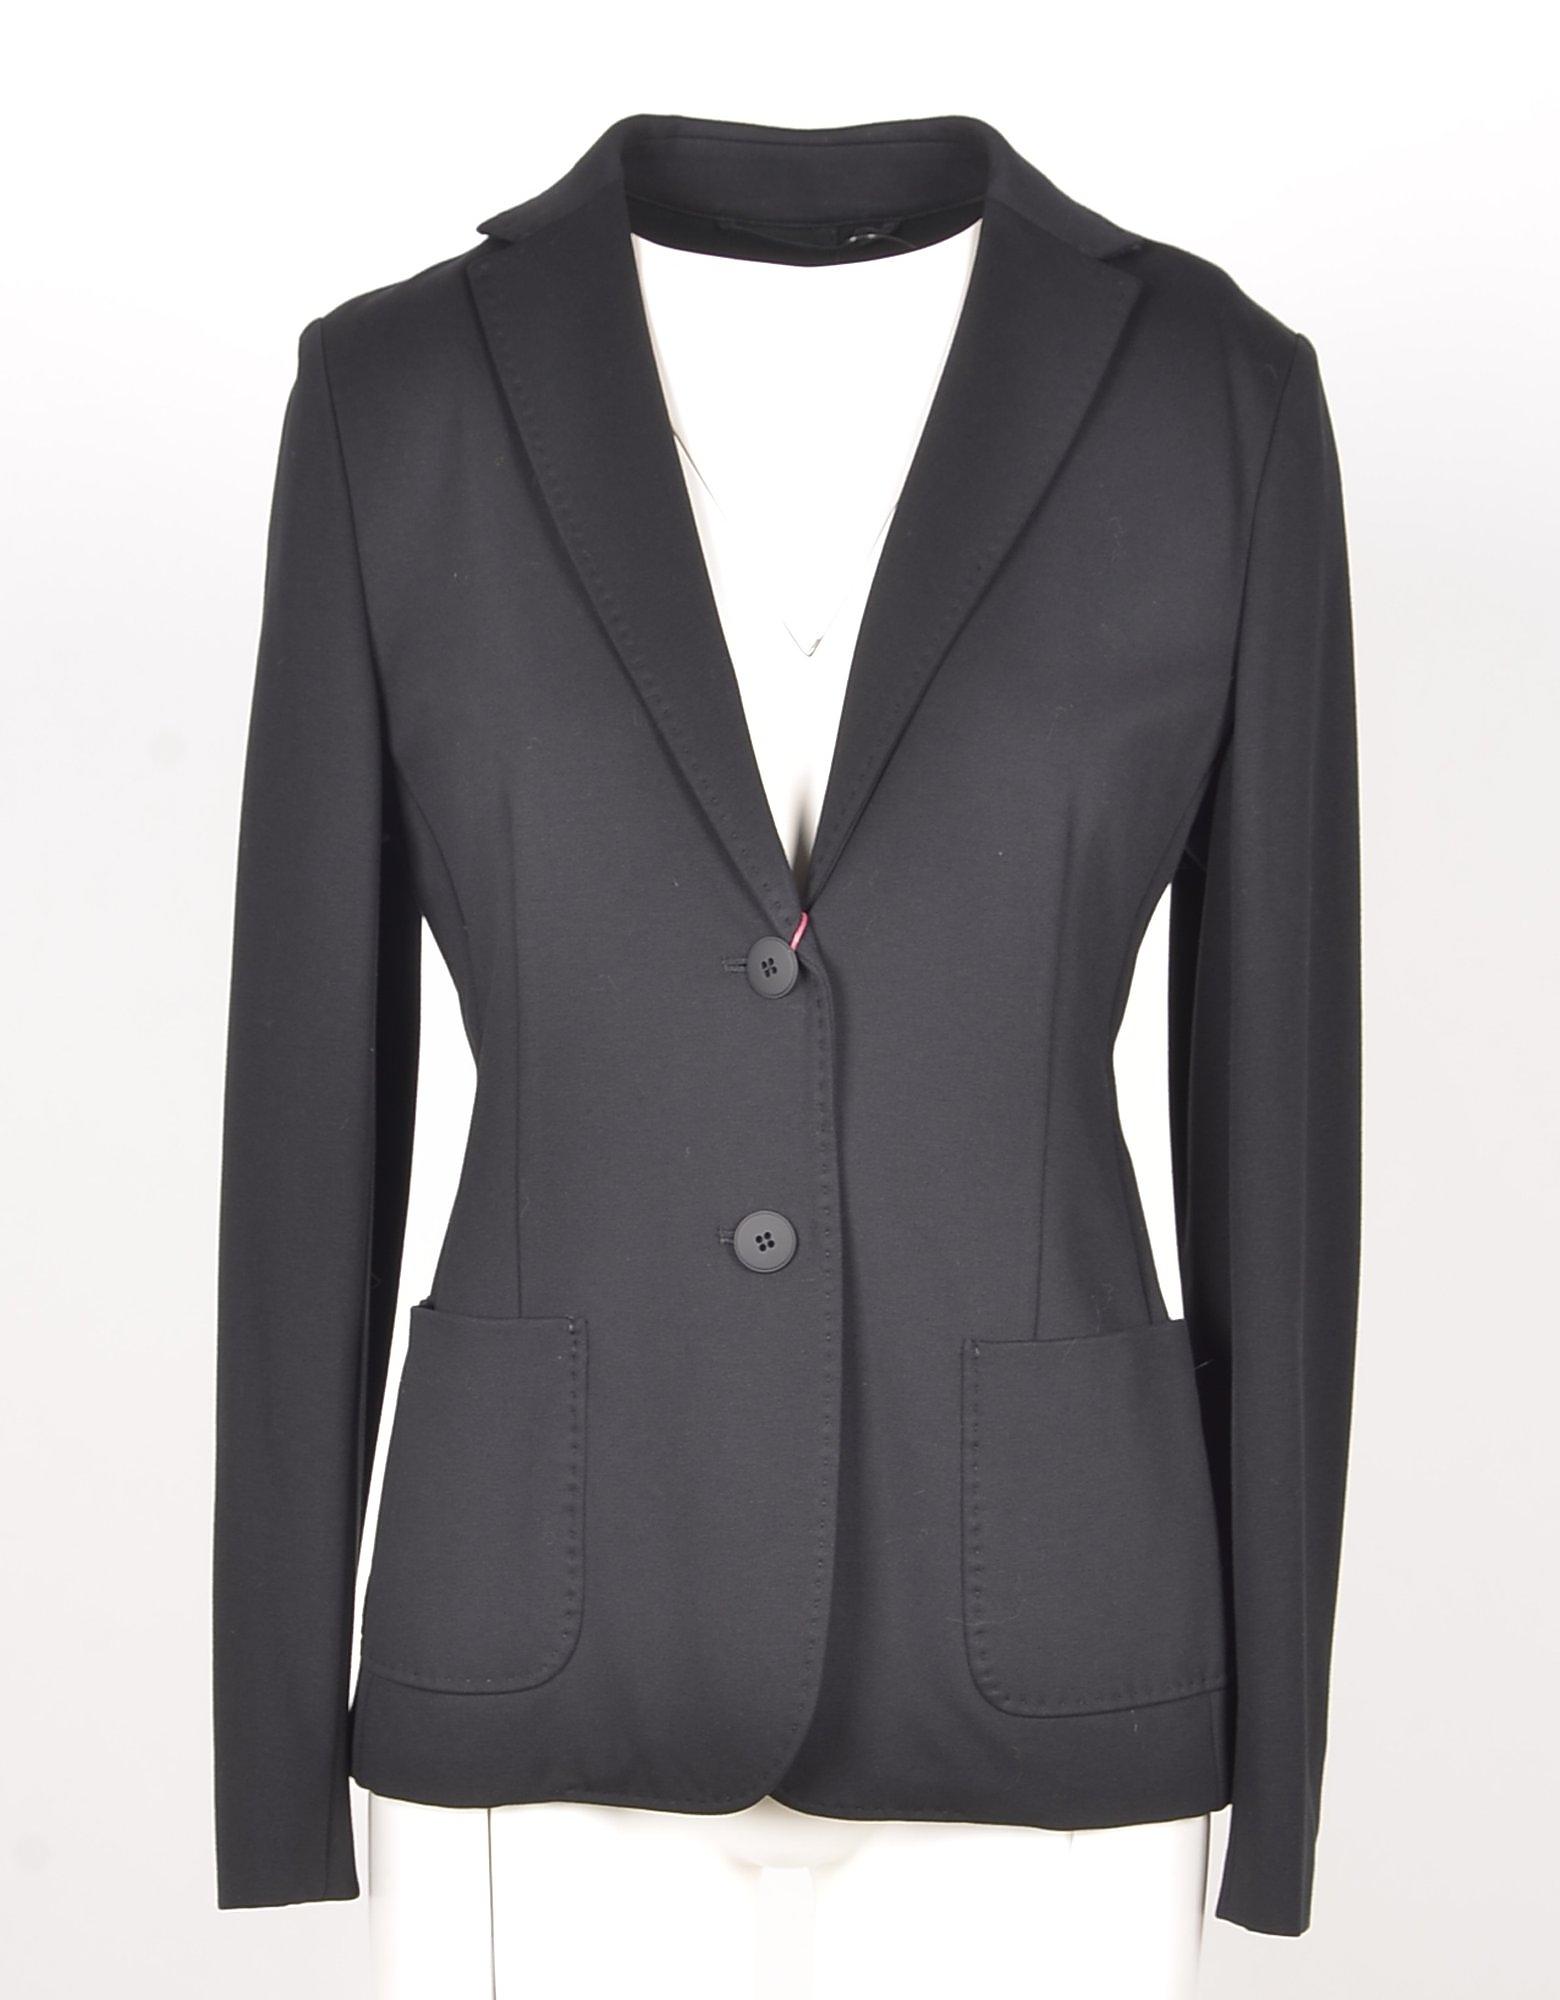 Max Mara Designer Coats & Jackets, Women's Black Blazer